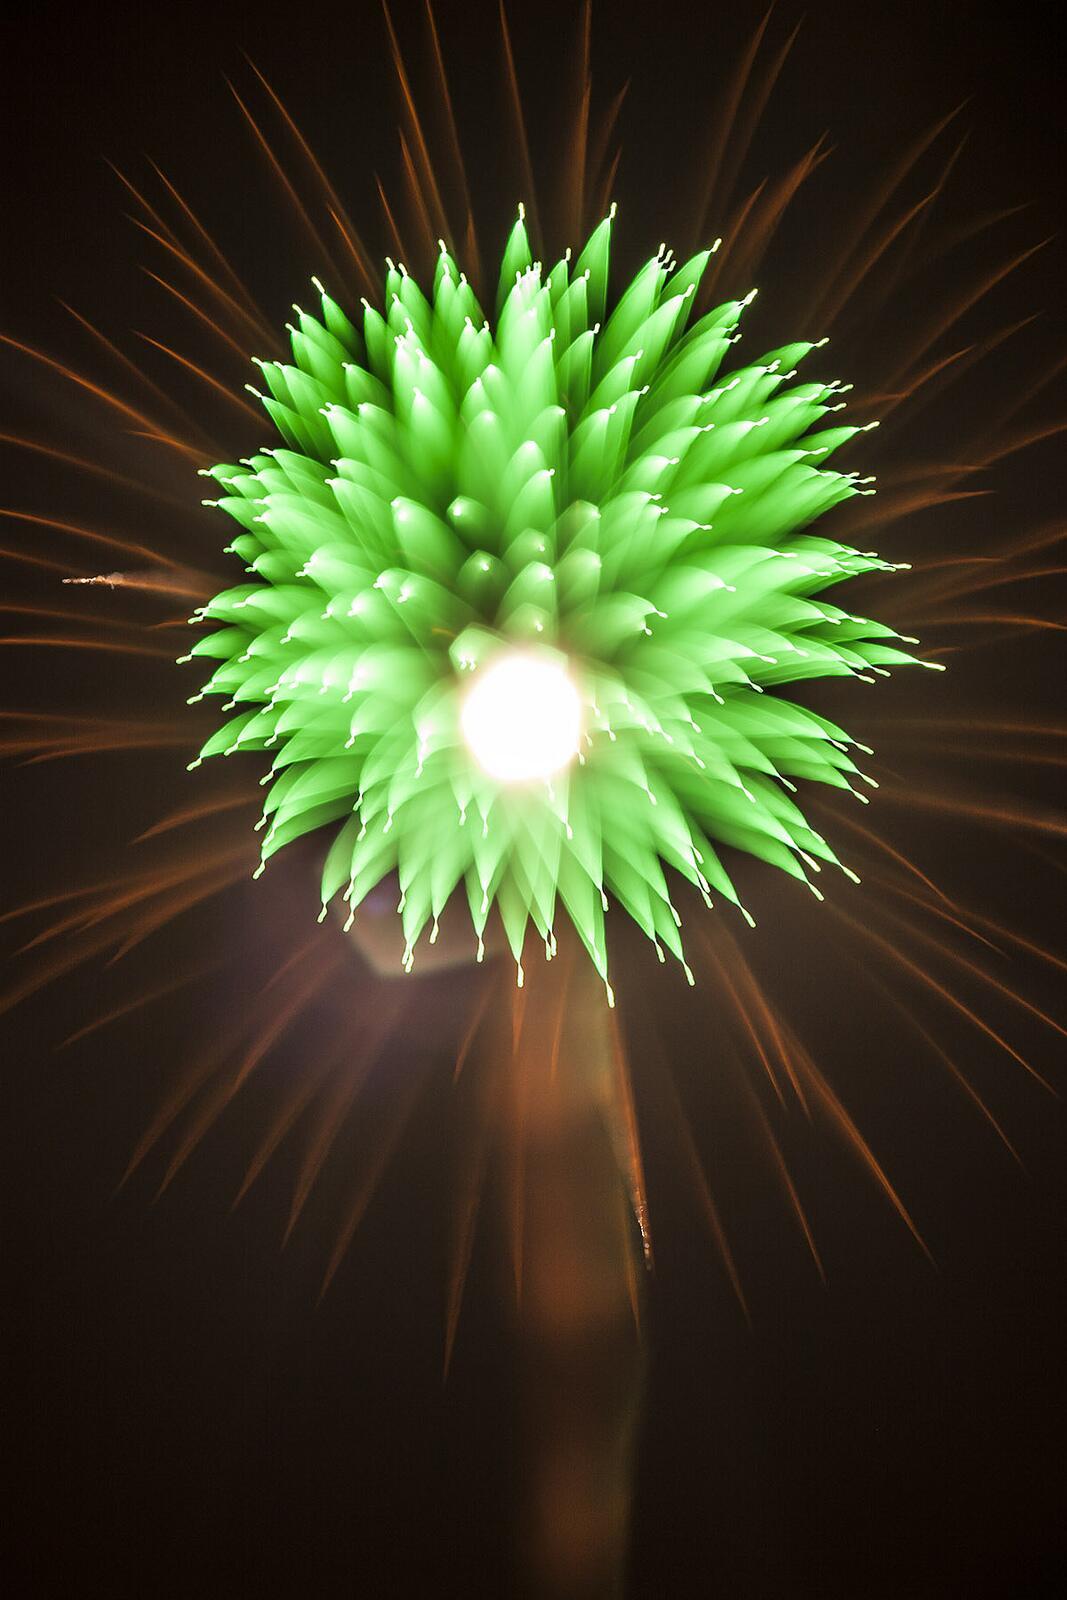 Long Exposure Fireworks by David Johnson http://t.co/Z8t25ey4oe